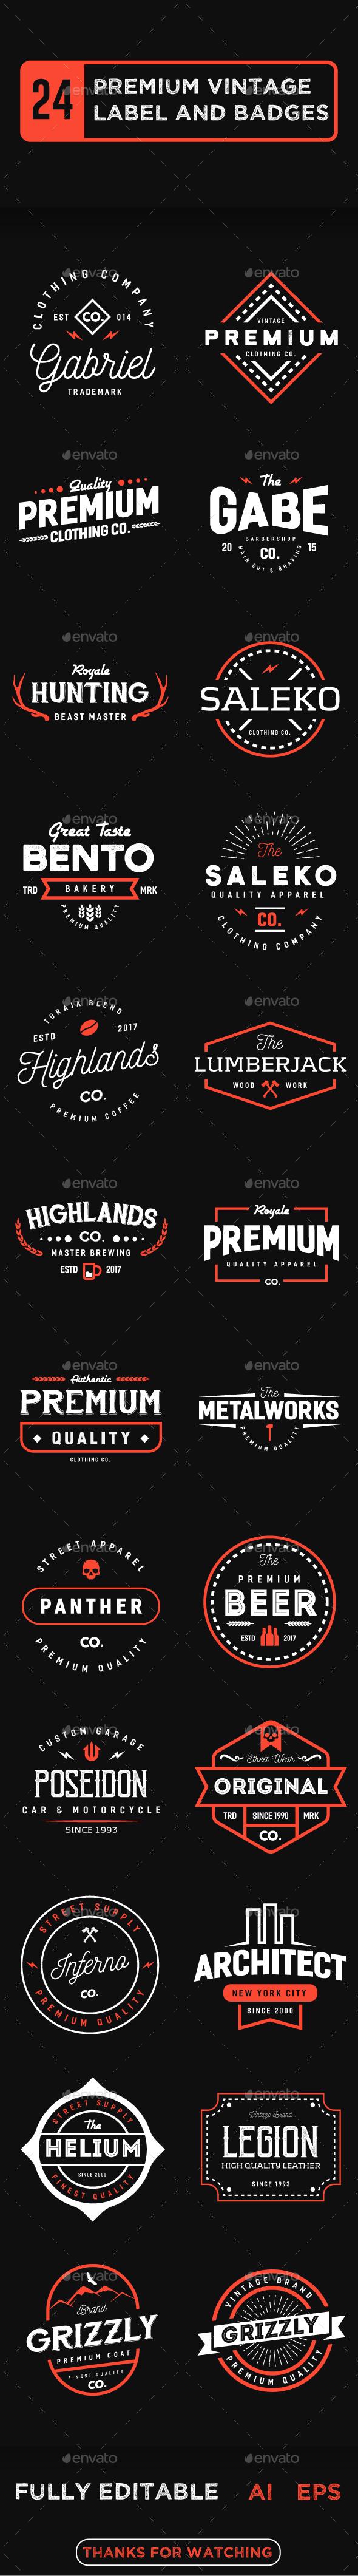 24 Premium Vintage Label and Badges - Badges & Stickers Web Elements